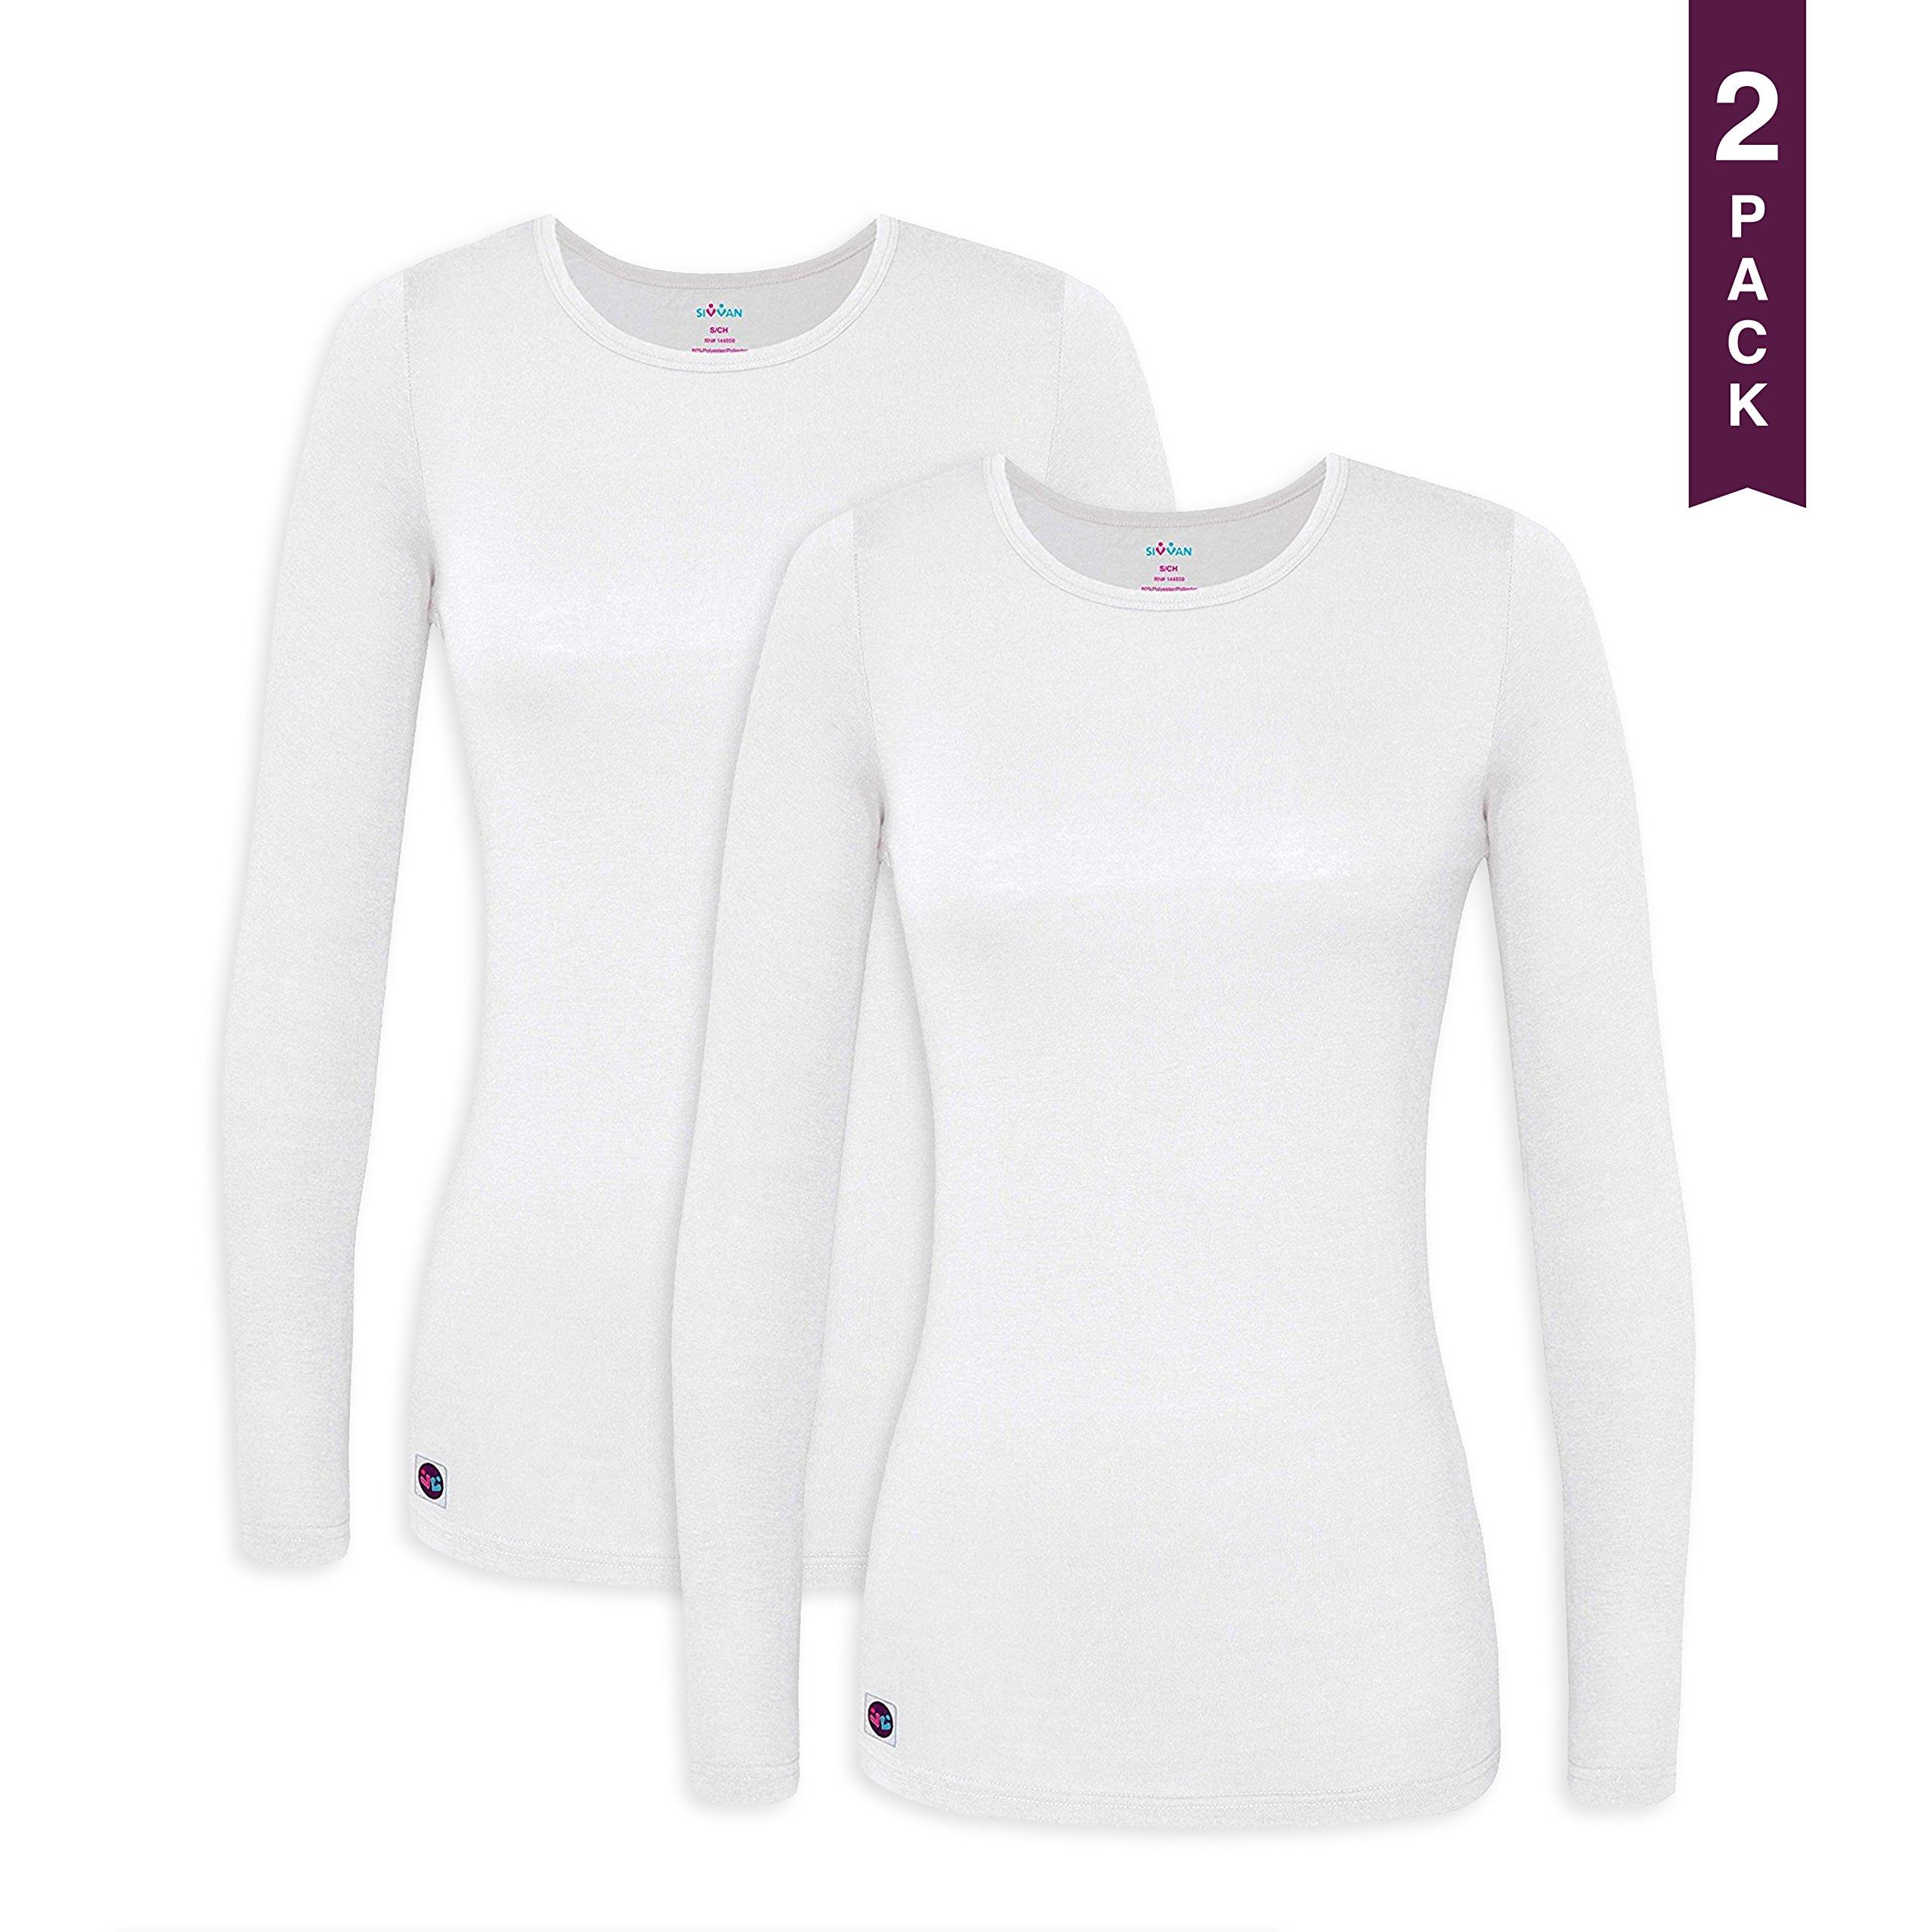 Sivvan 2 Pack Women's Comfort Long Sleeve T-Shirt / Underscrub Tee - S8500-2 - WHT - S